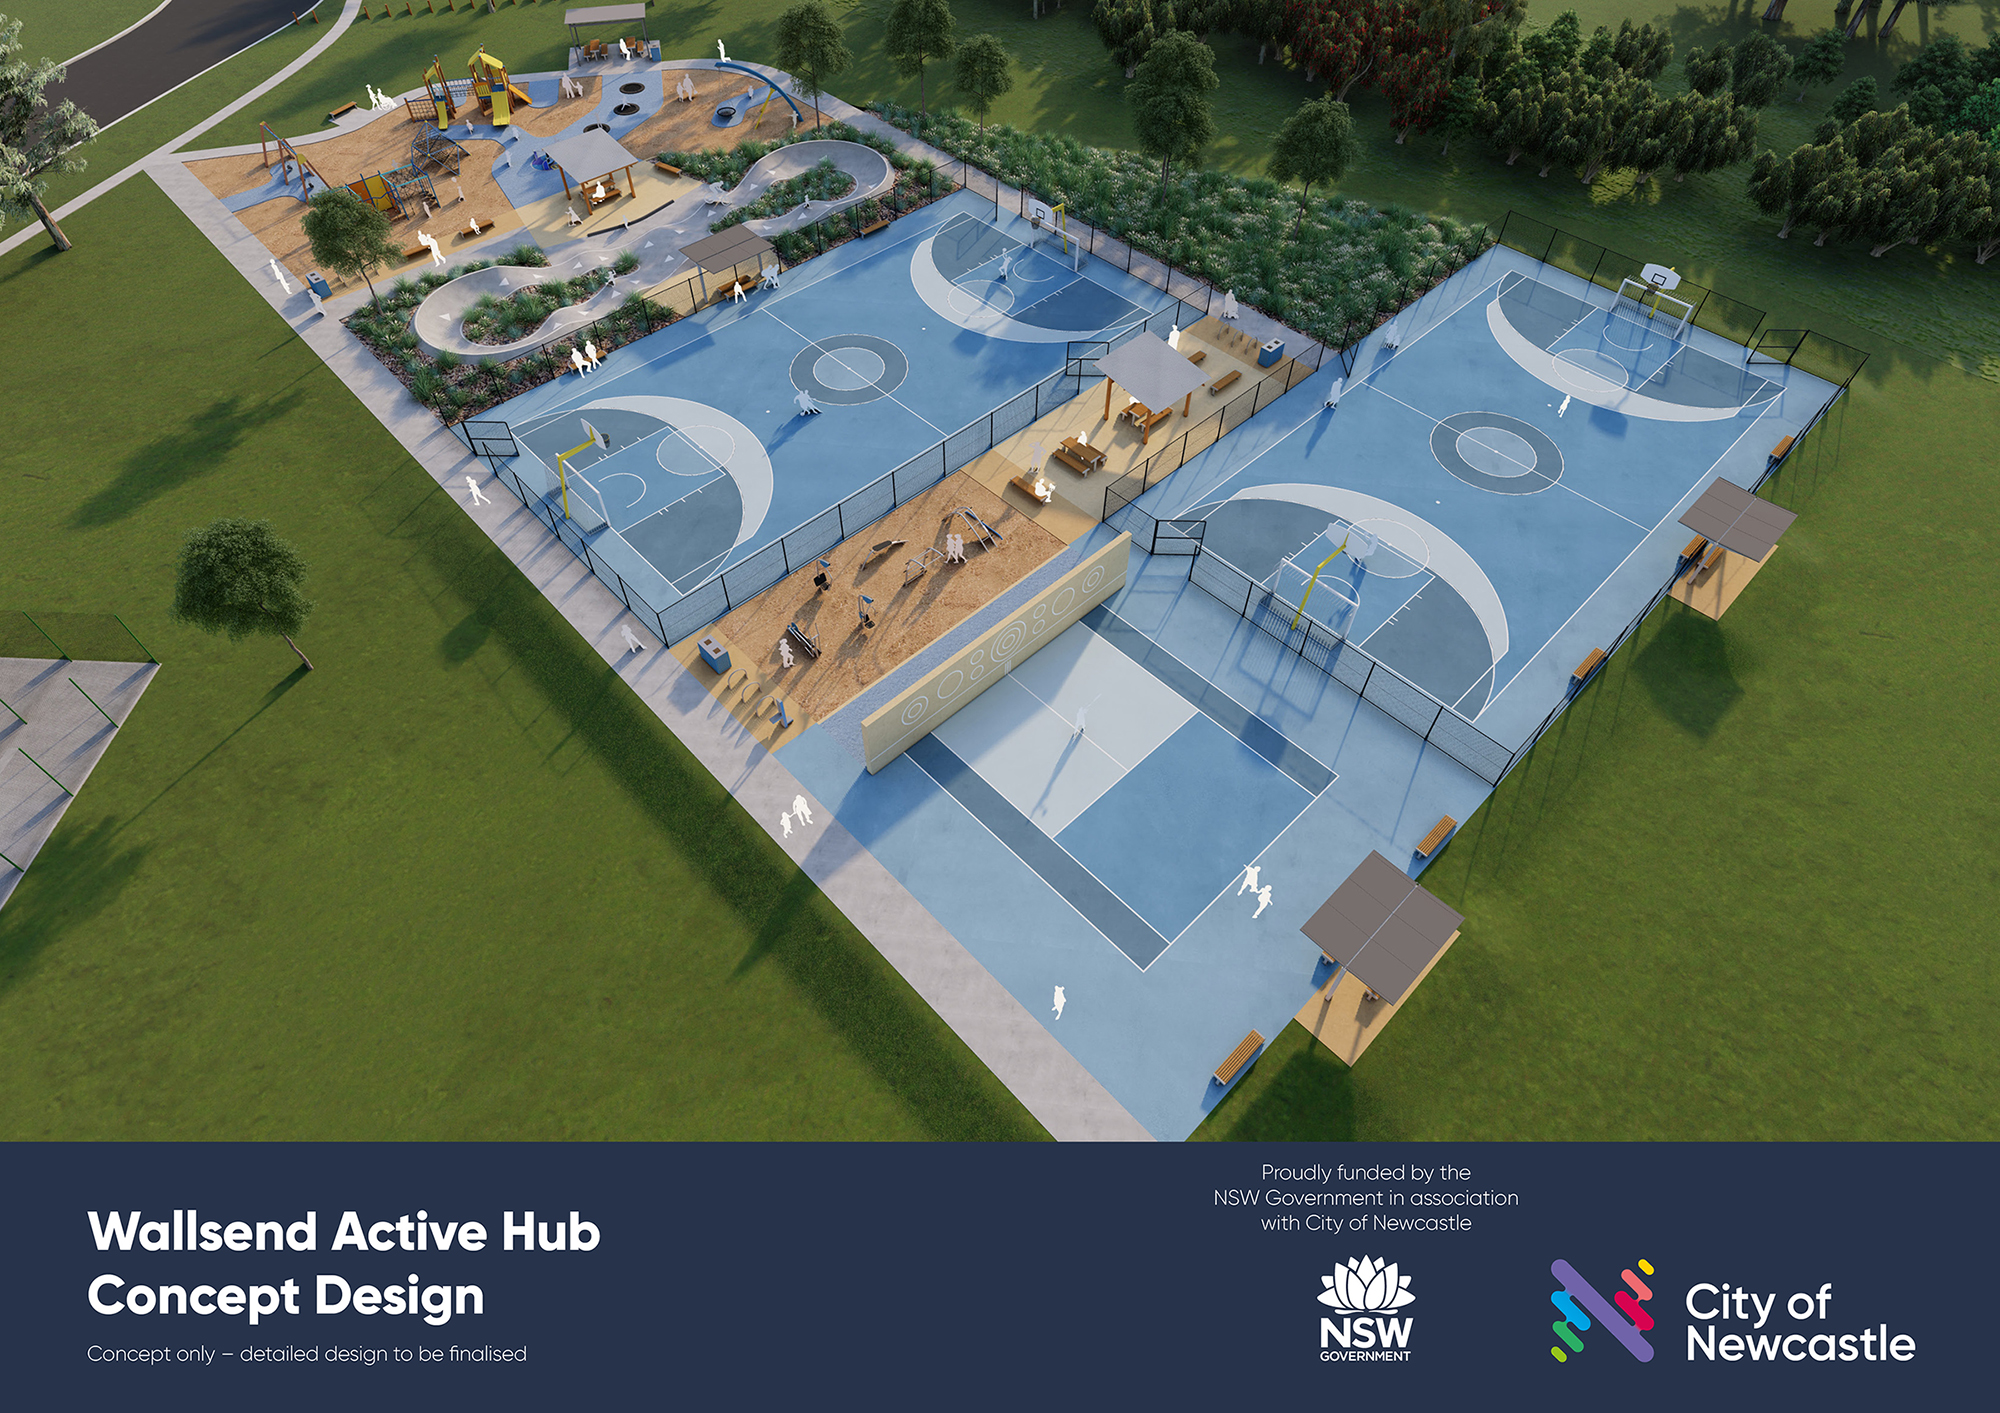 Wallsend-Active-Hub-concept-design-1.jpg